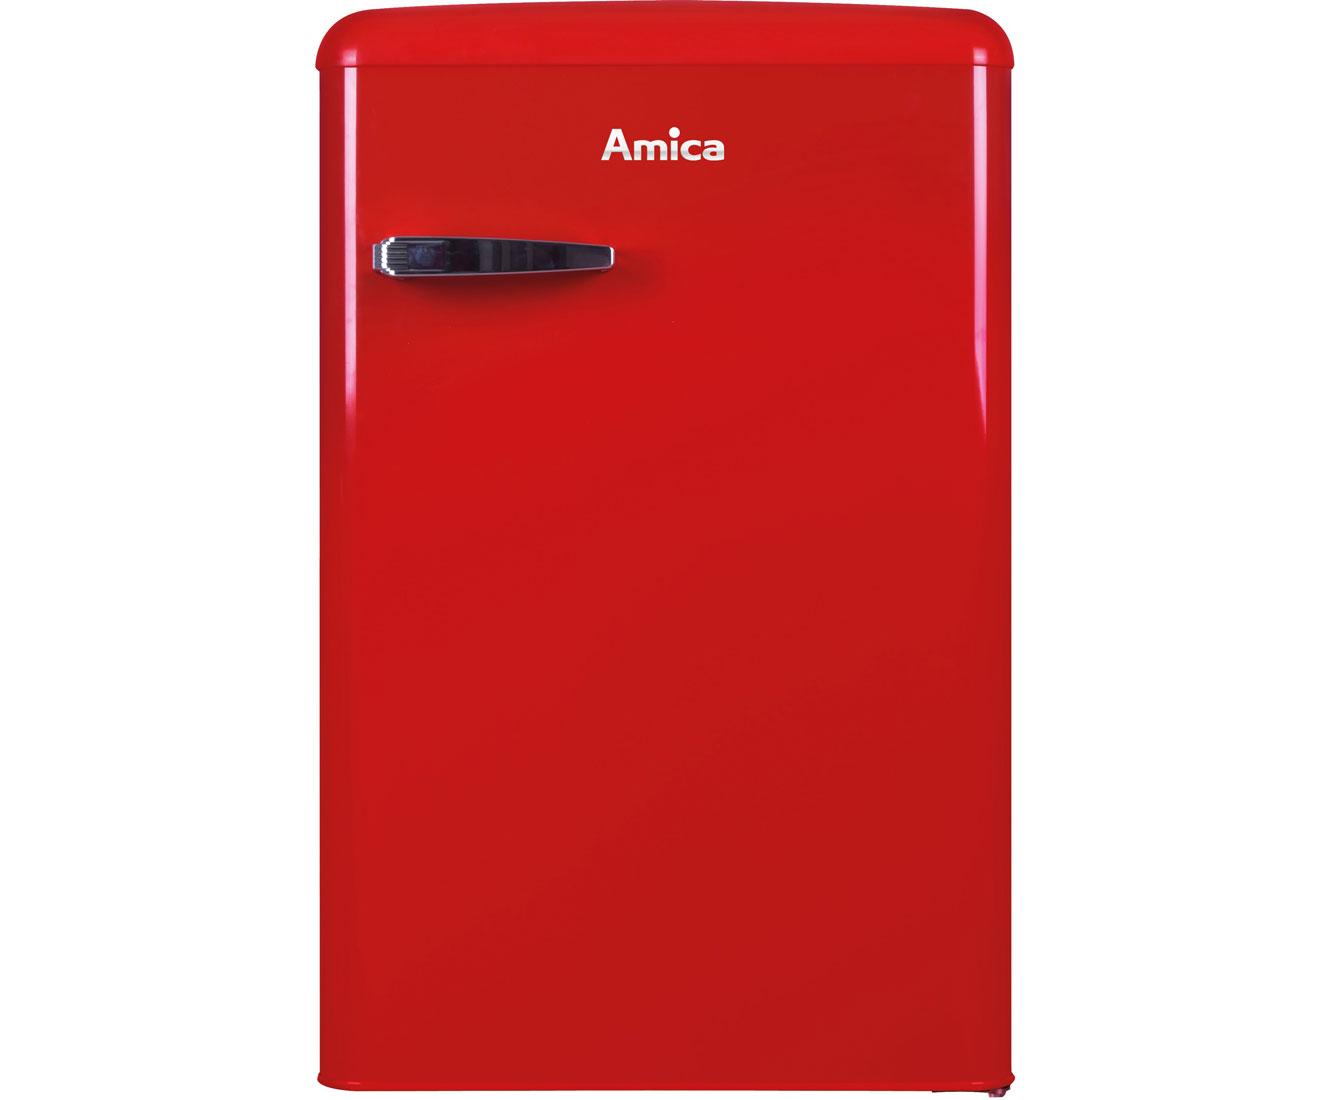 Kühlschrank Rot : Amica vks 15620 r kühlschrank rot retro design a